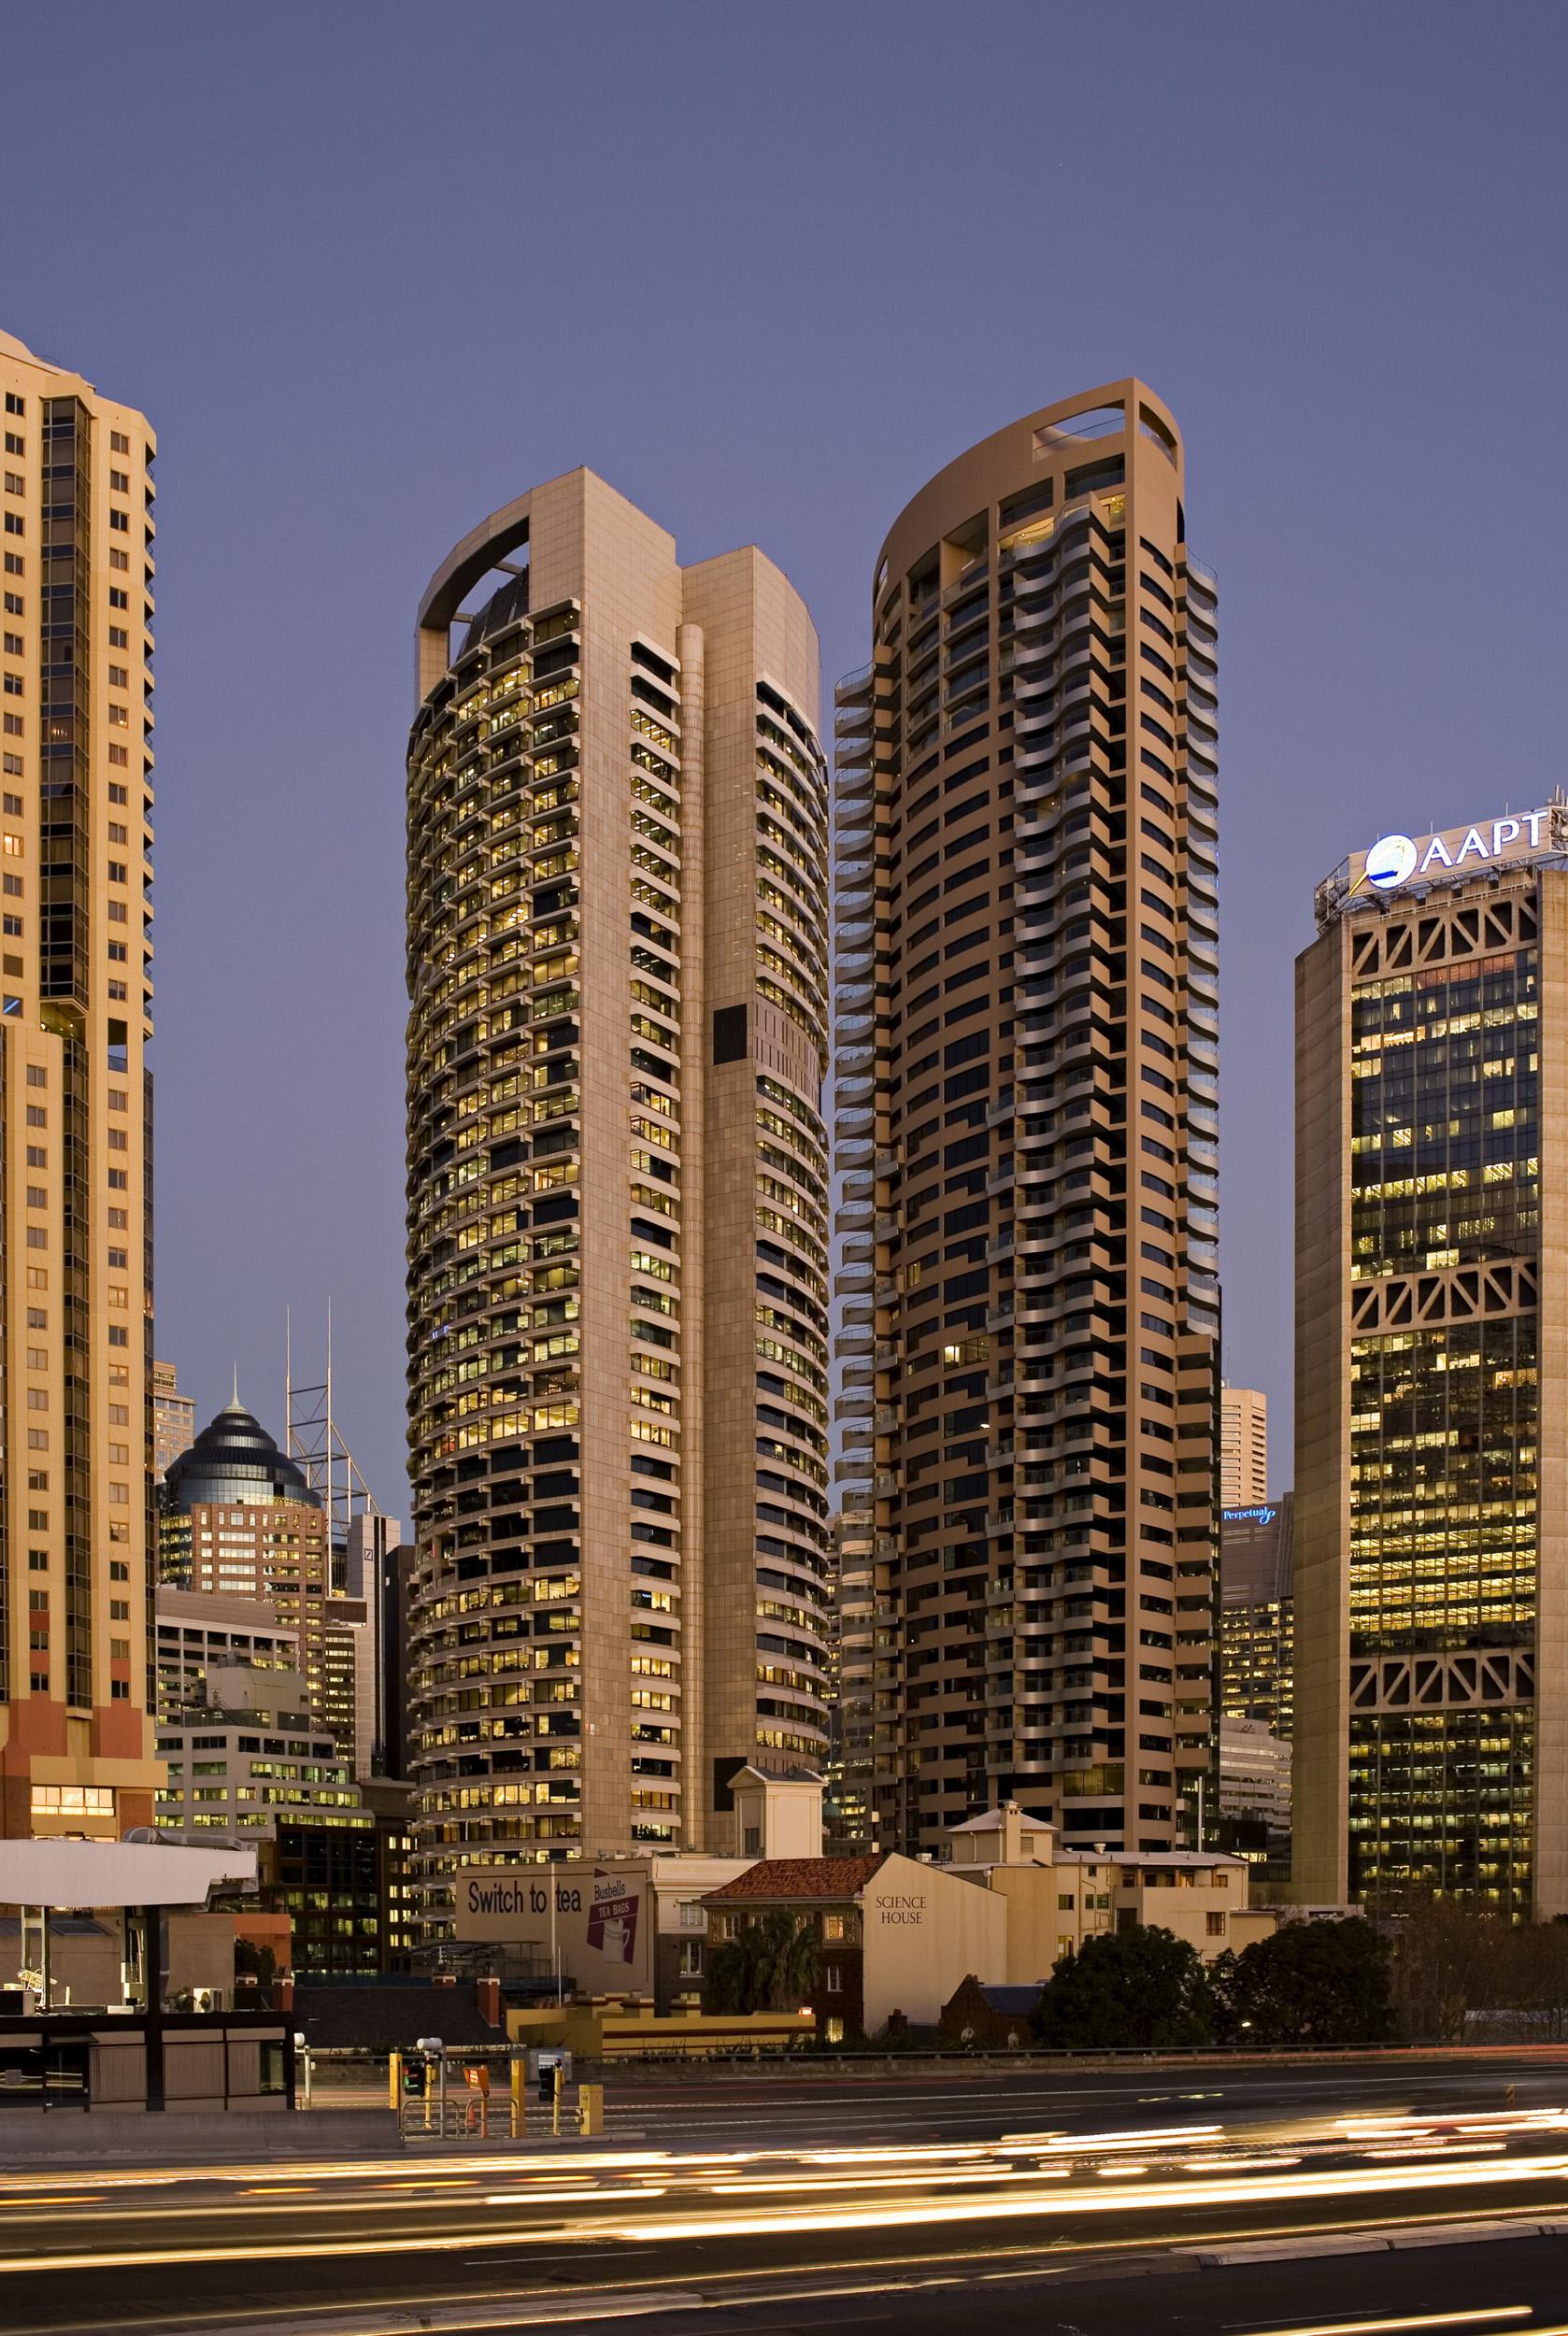 hirise_architecture_sydney_australia_04.jpg